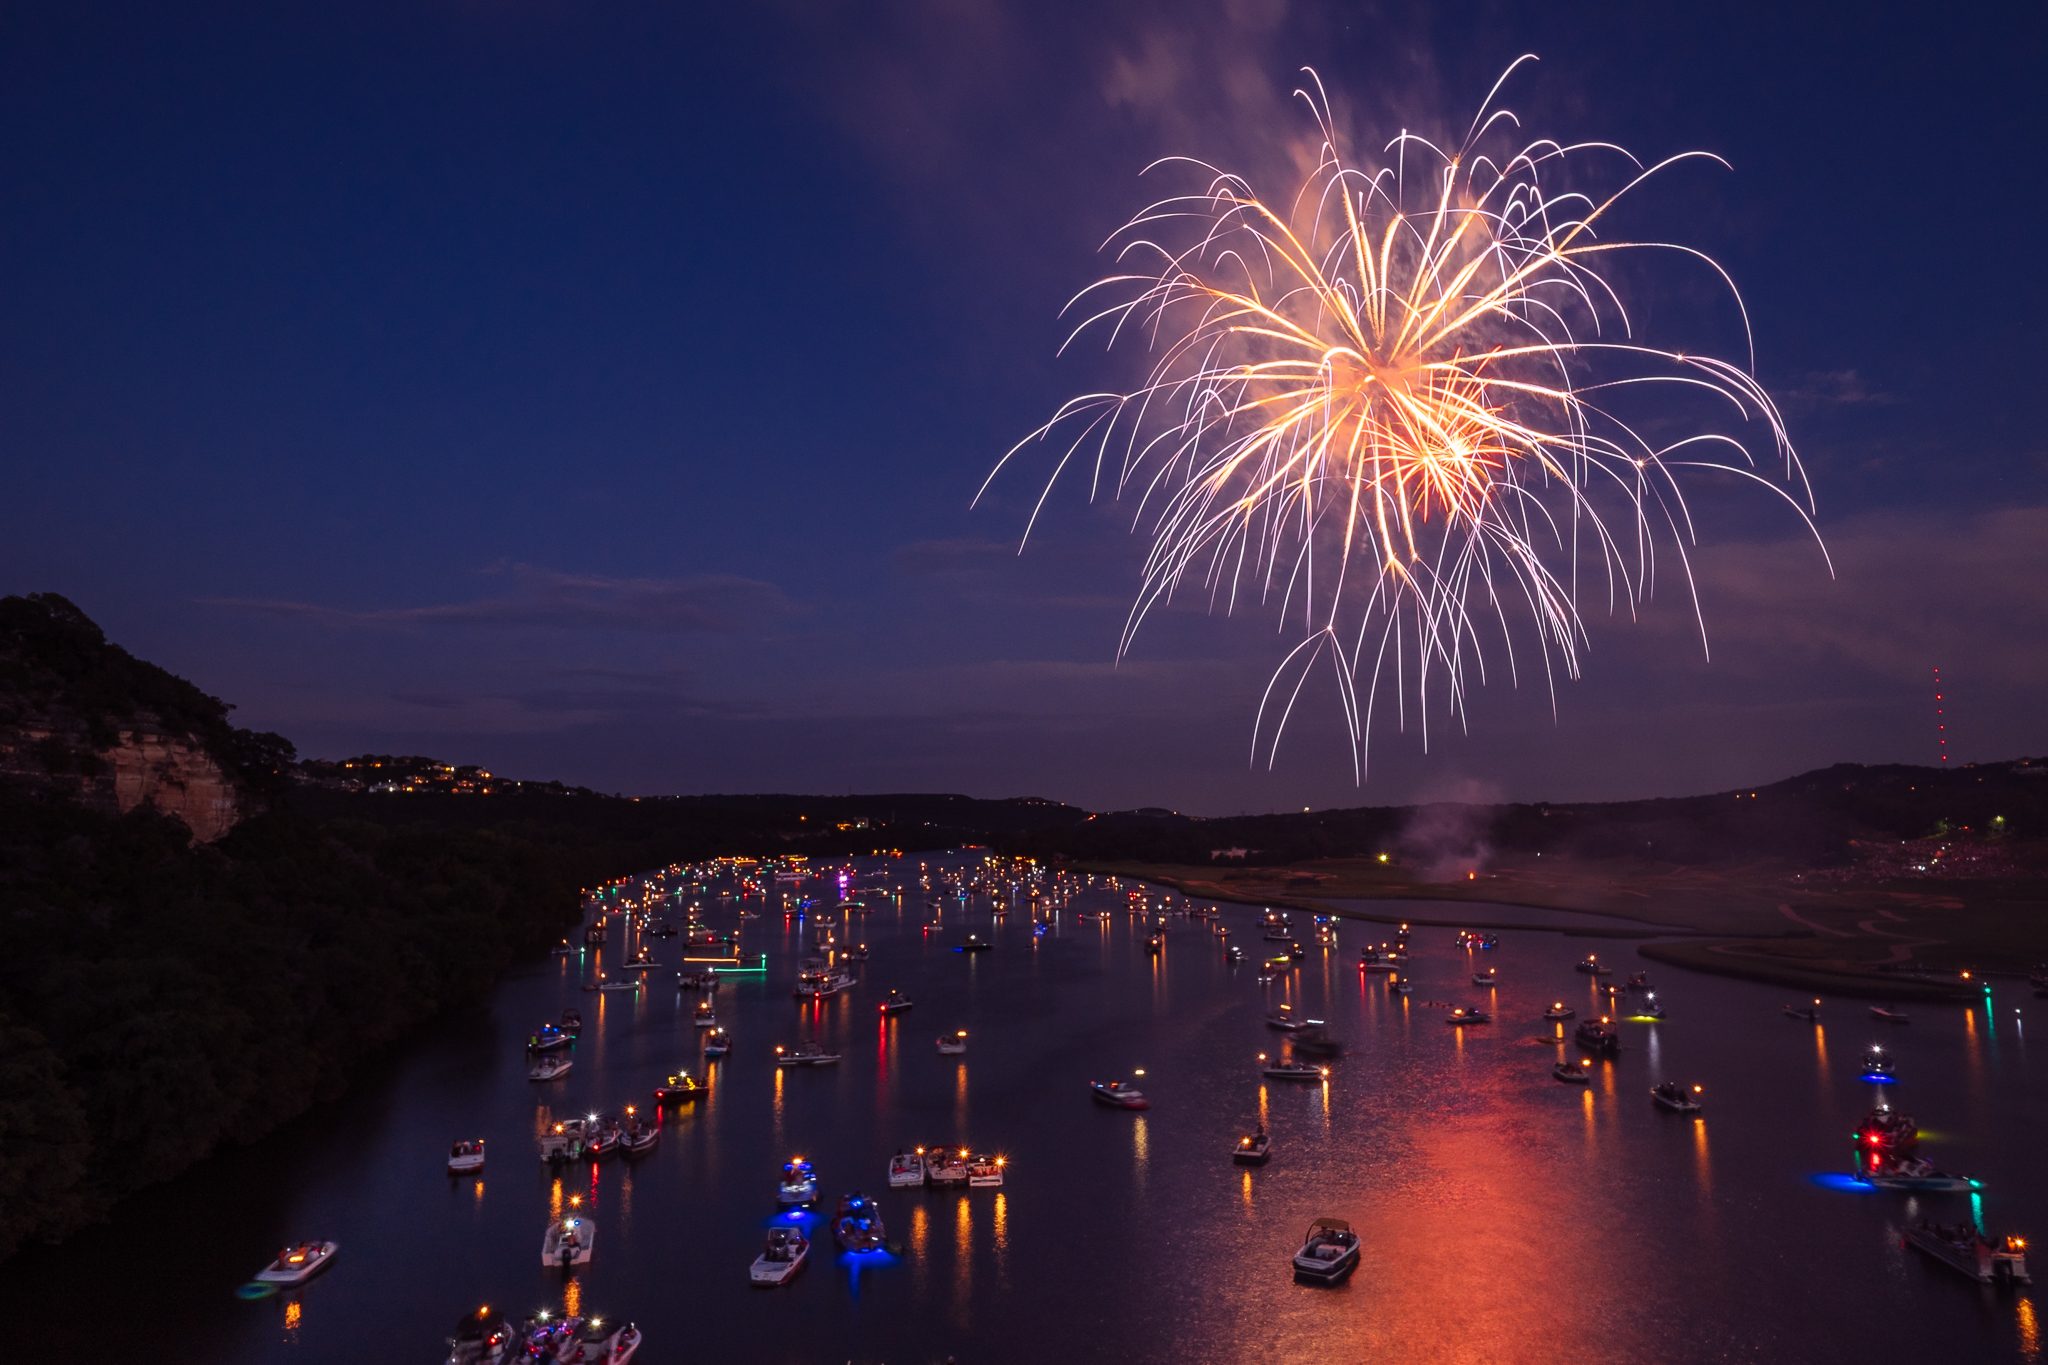 austin_fireworks_2014_3.jpg